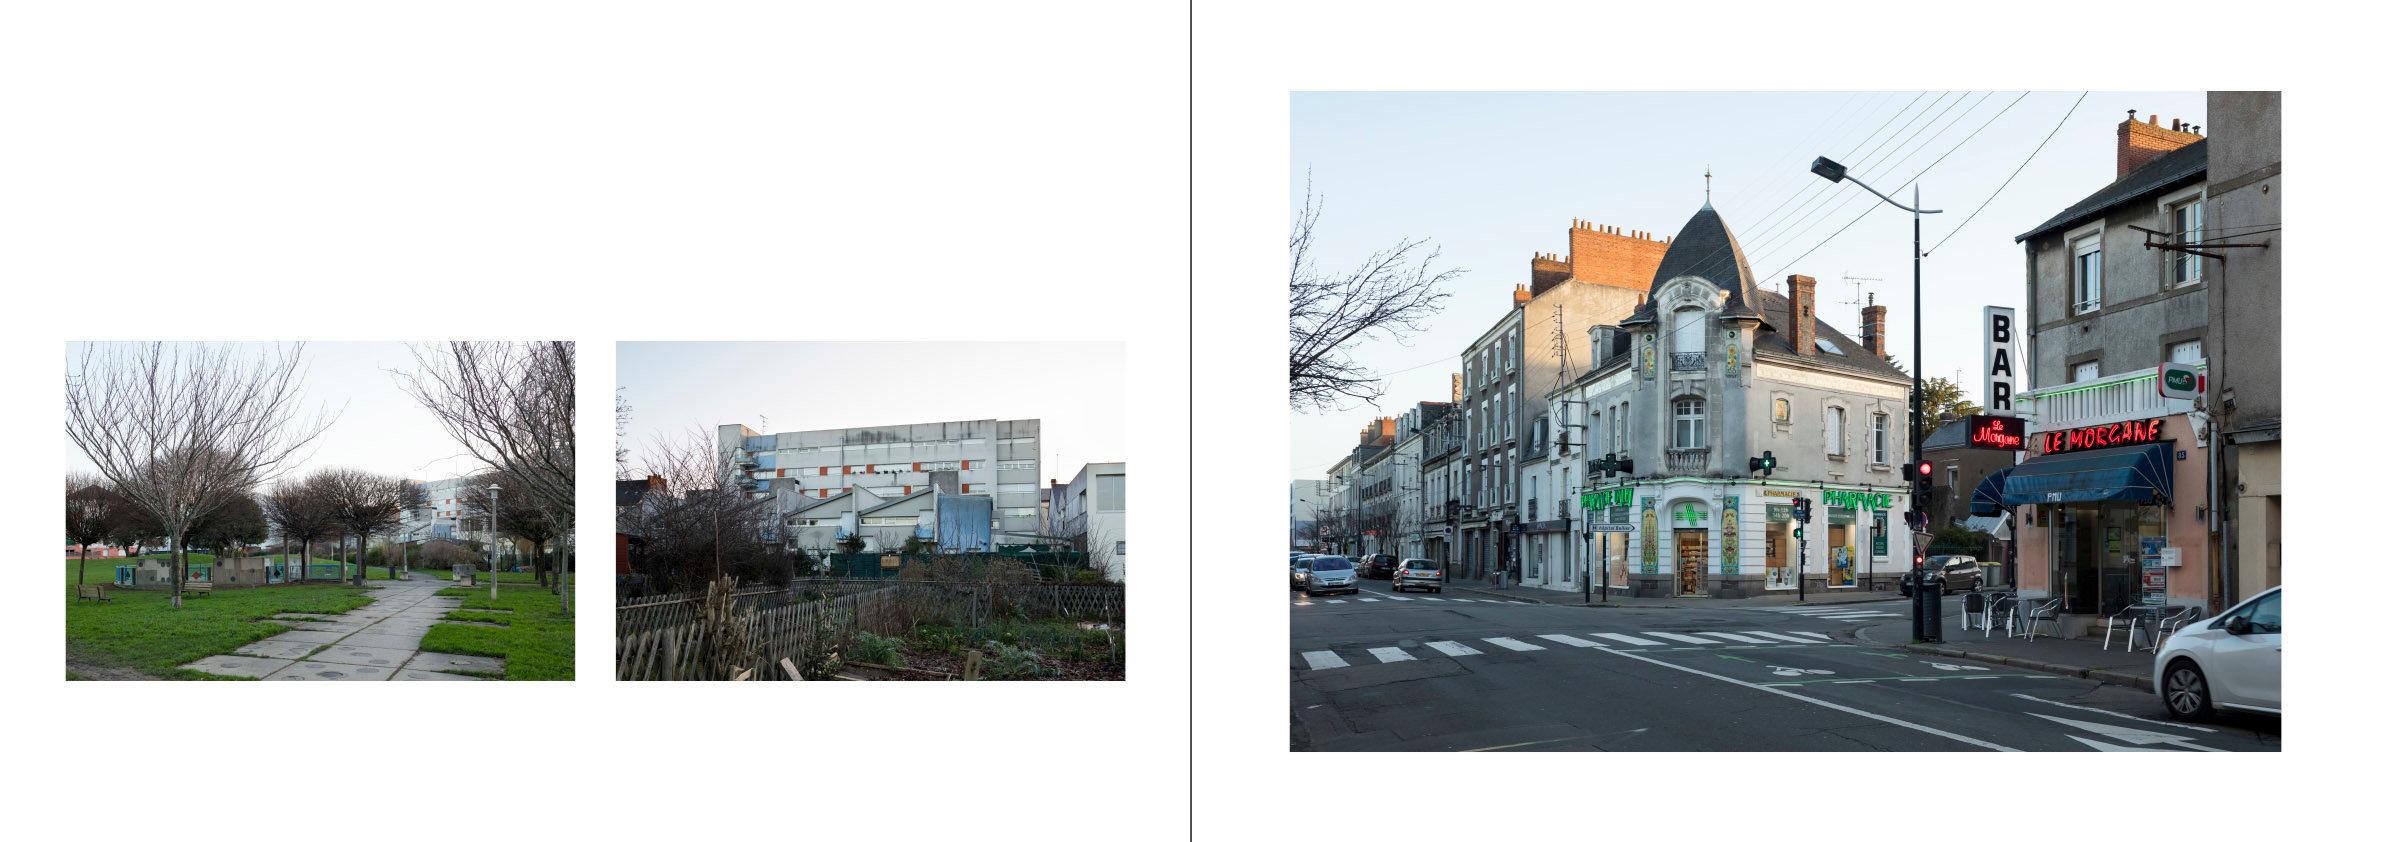 Nantes-Carquefou-Ste Luce A3-page005.jpeg